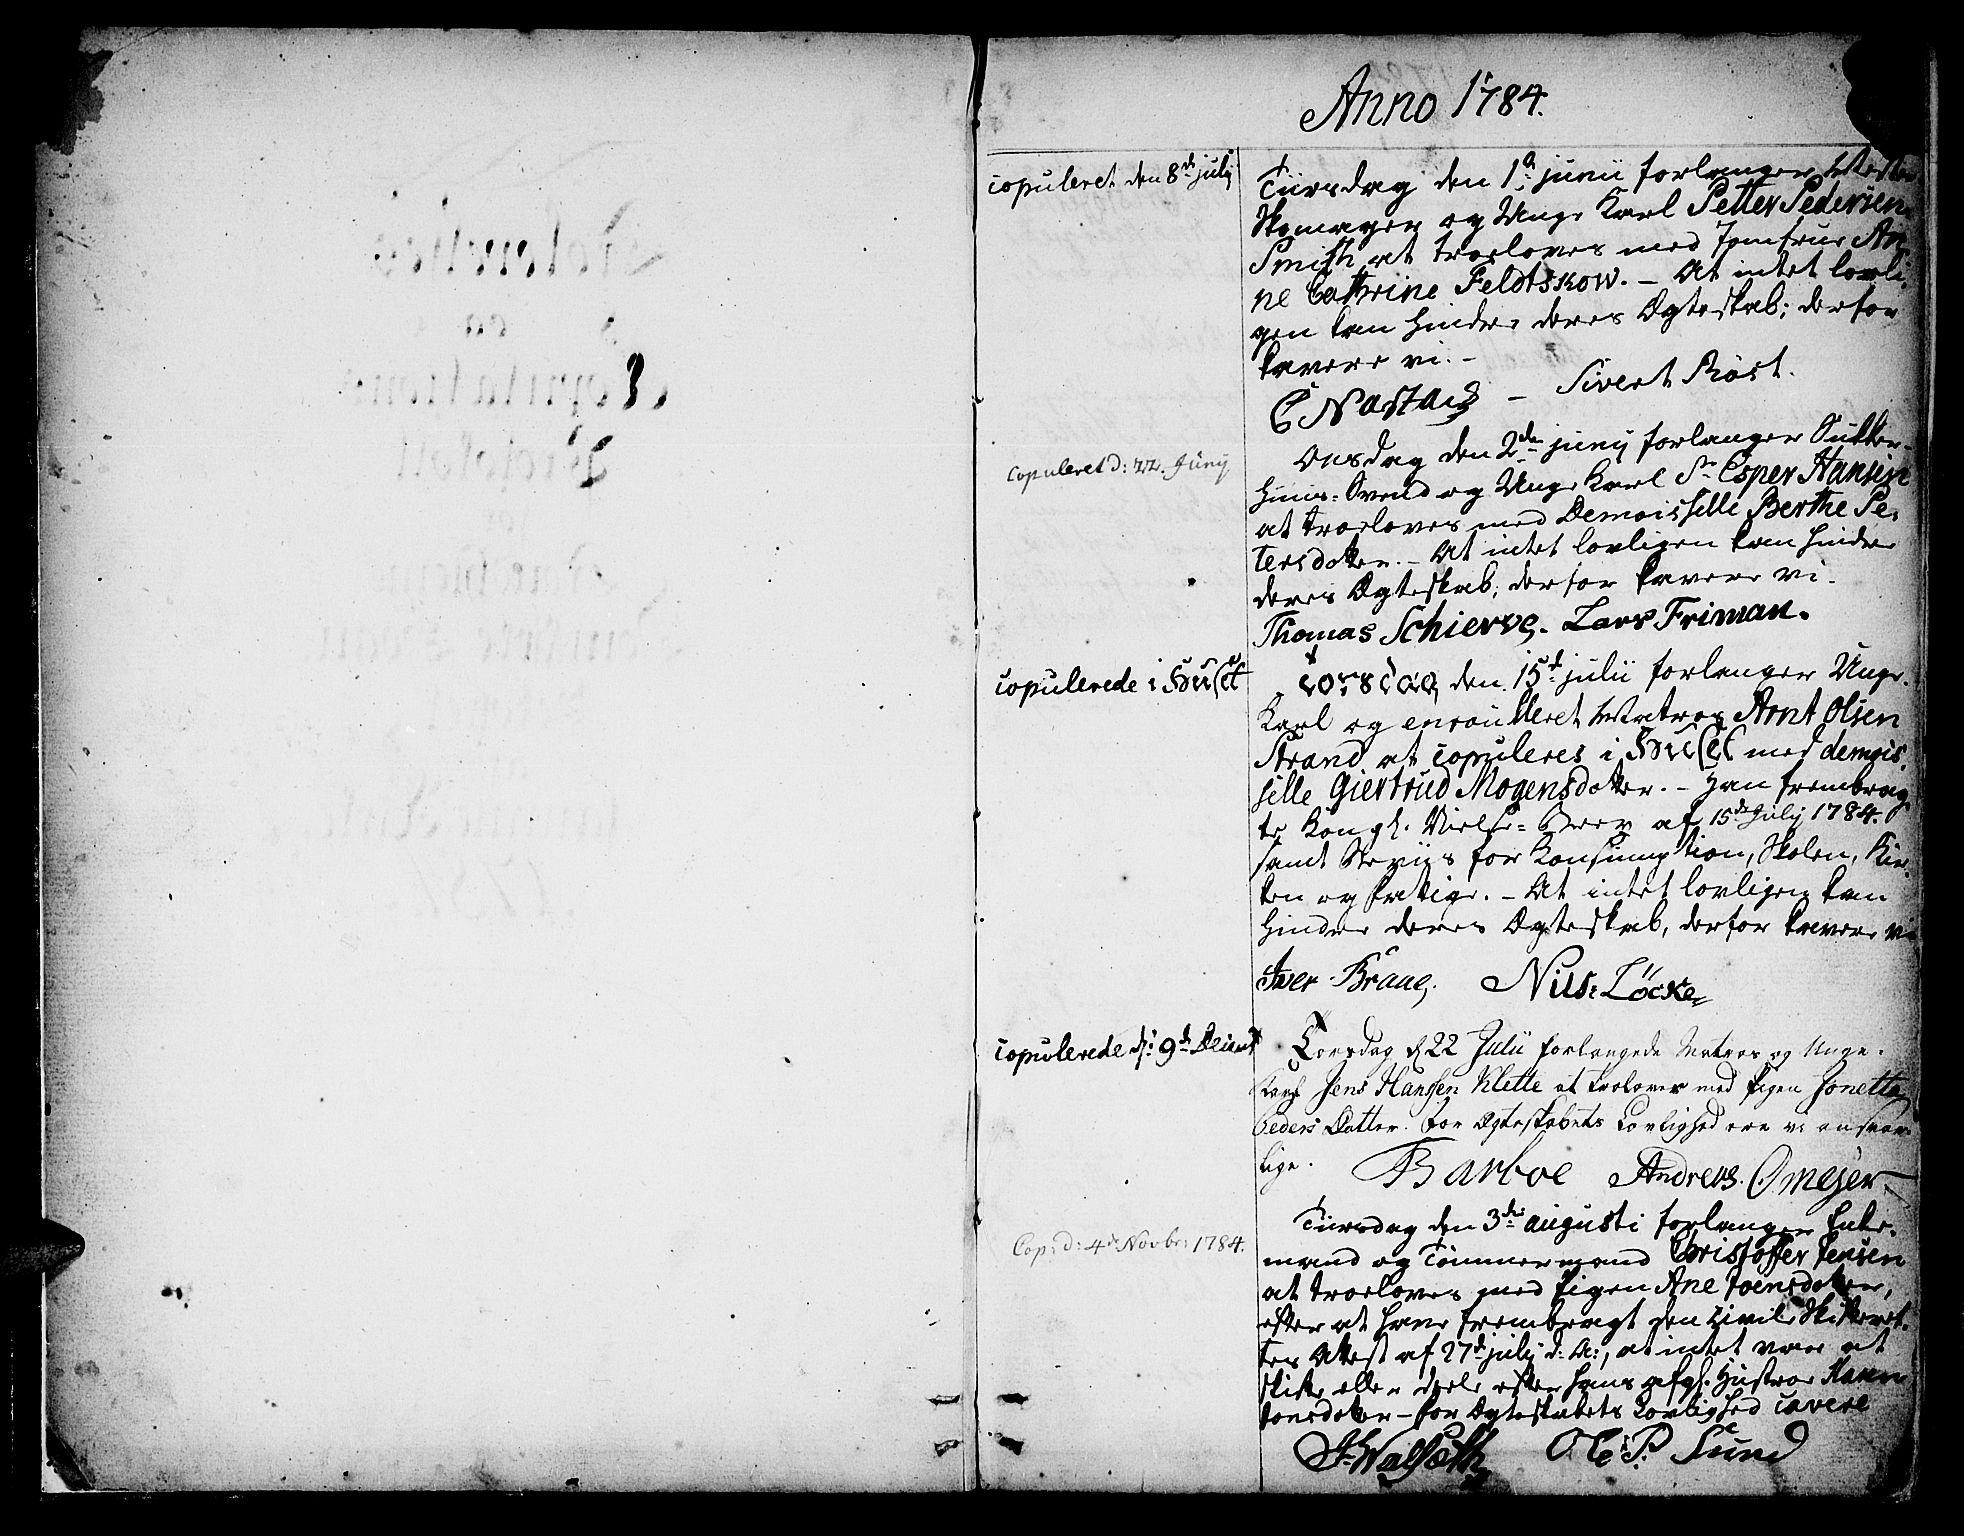 SAT, Ministerialprotokoller, klokkerbøker og fødselsregistre - Sør-Trøndelag, 601/L0041: Parish register (official) no. 601A09, 1784-1801, p. 2